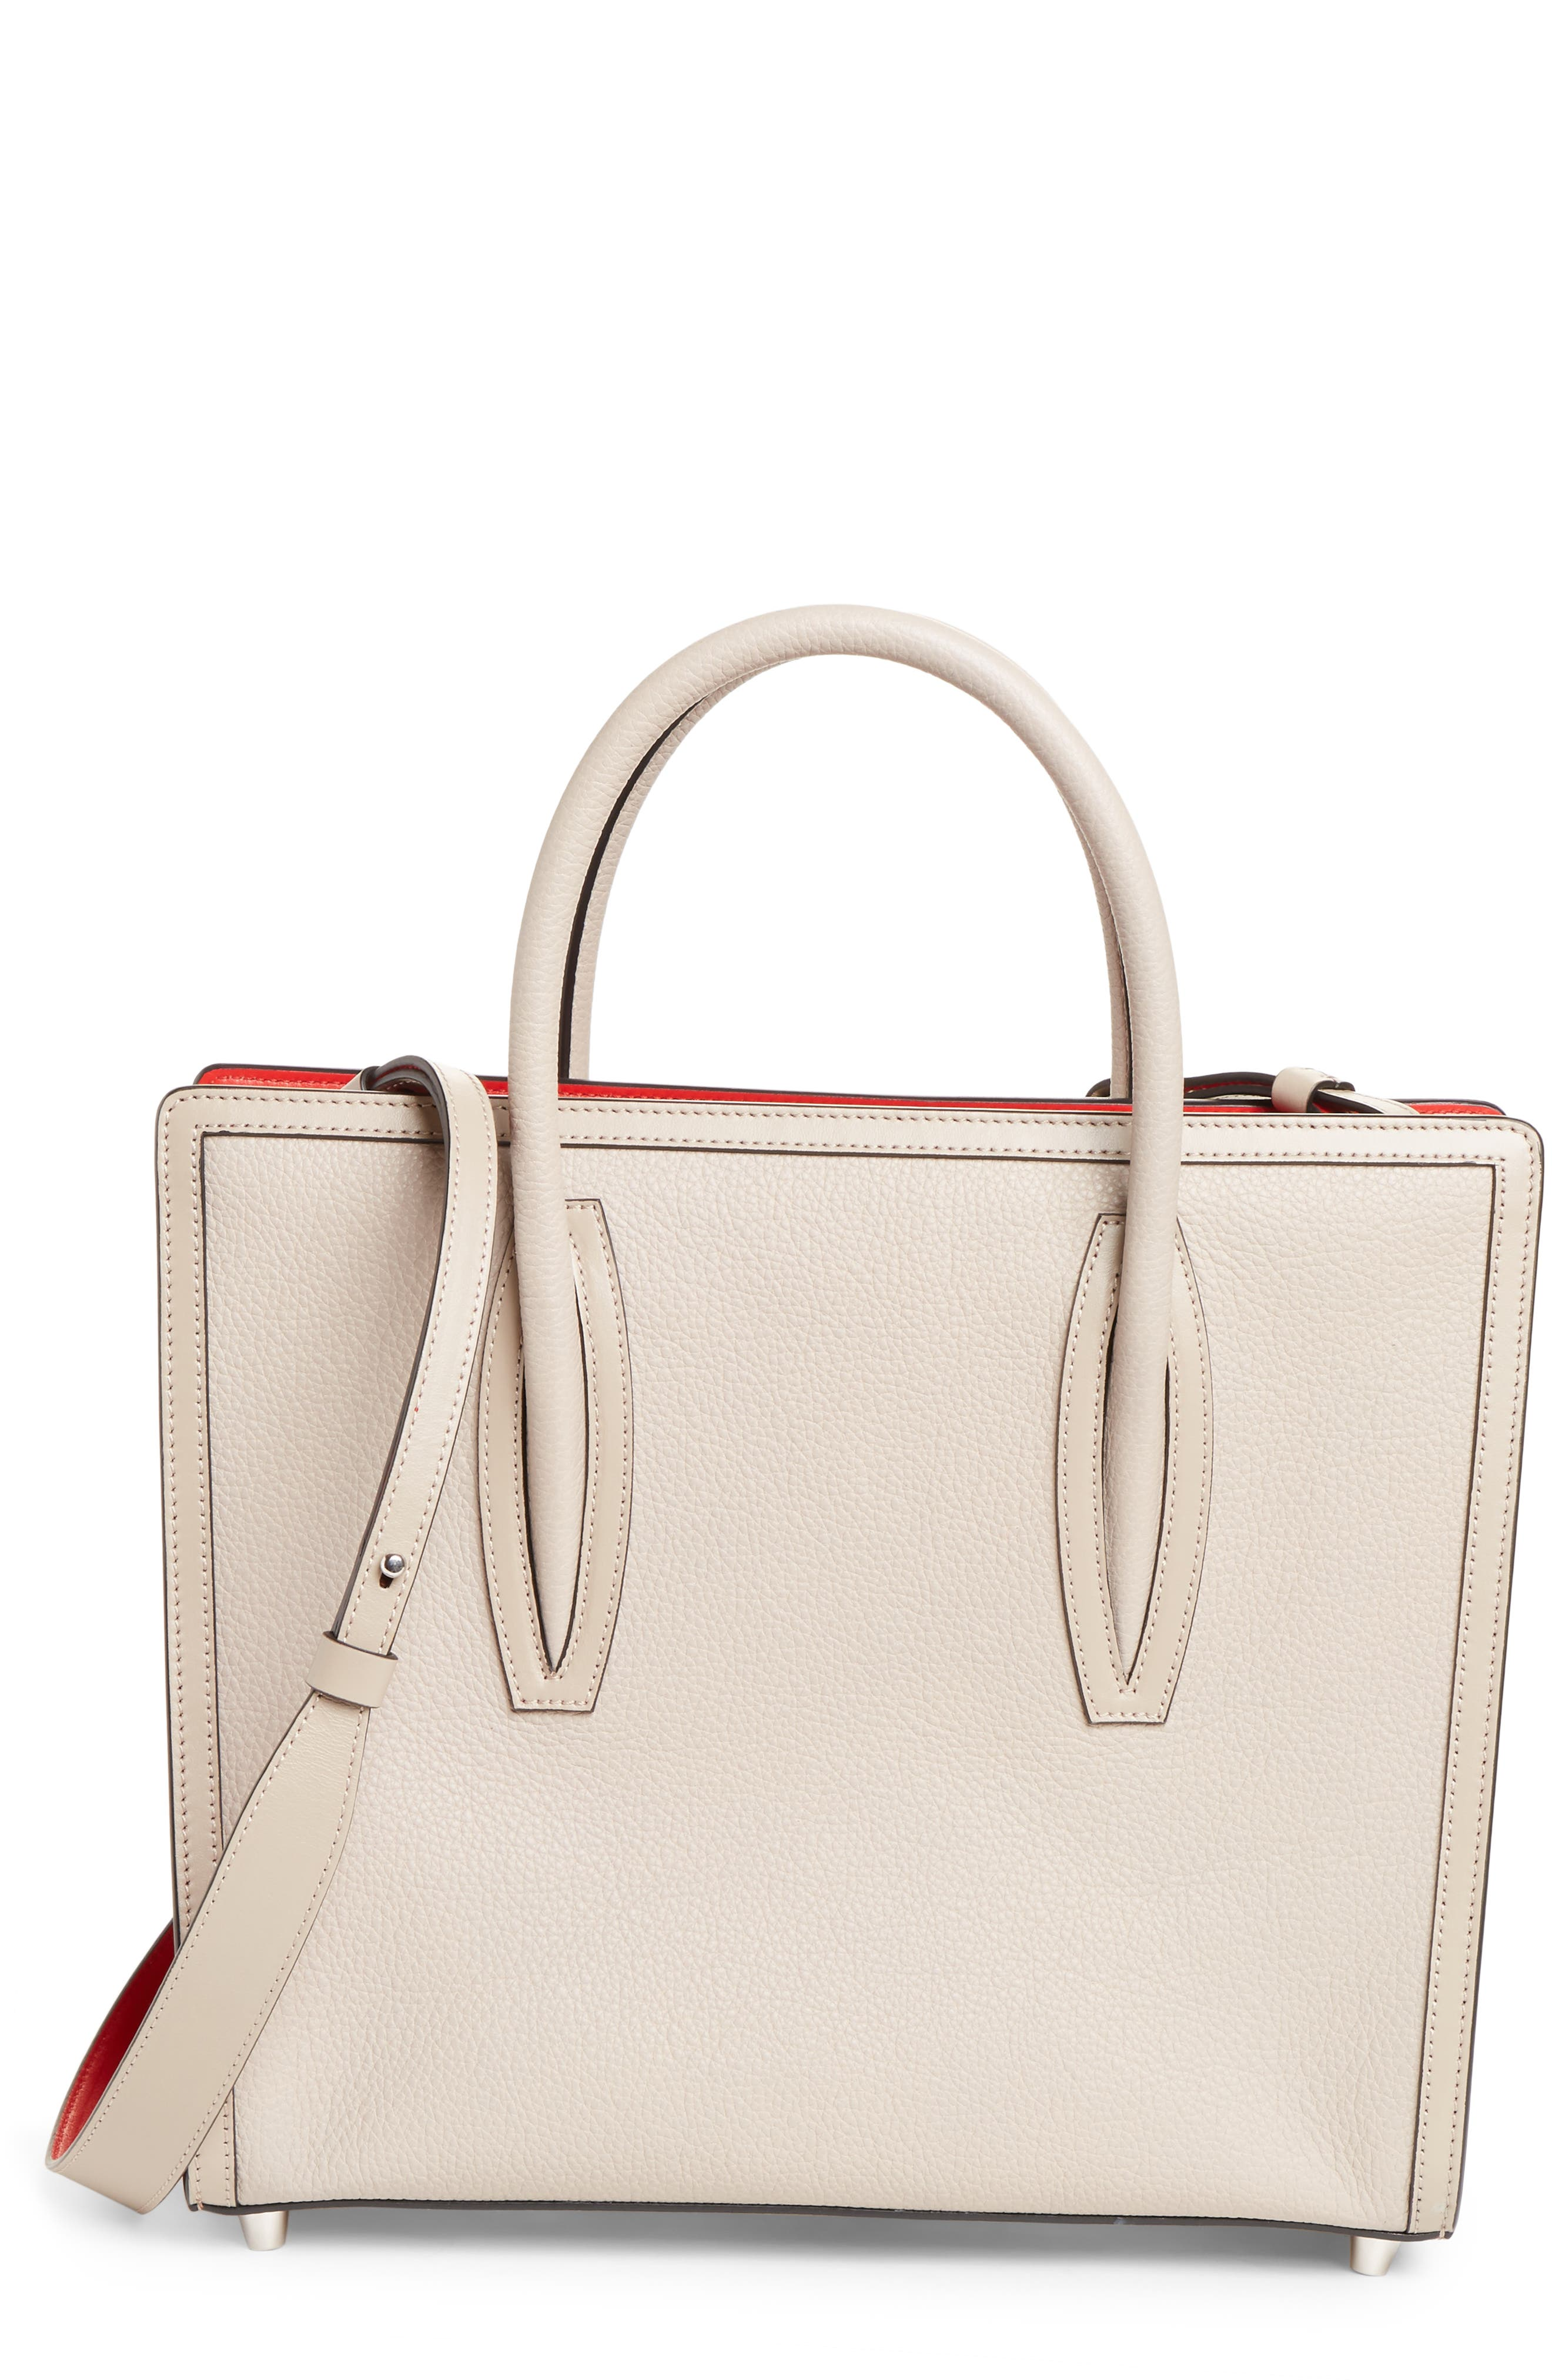 aadd73a99e0 Women's Open Christian Louboutin Handbags | Nordstrom